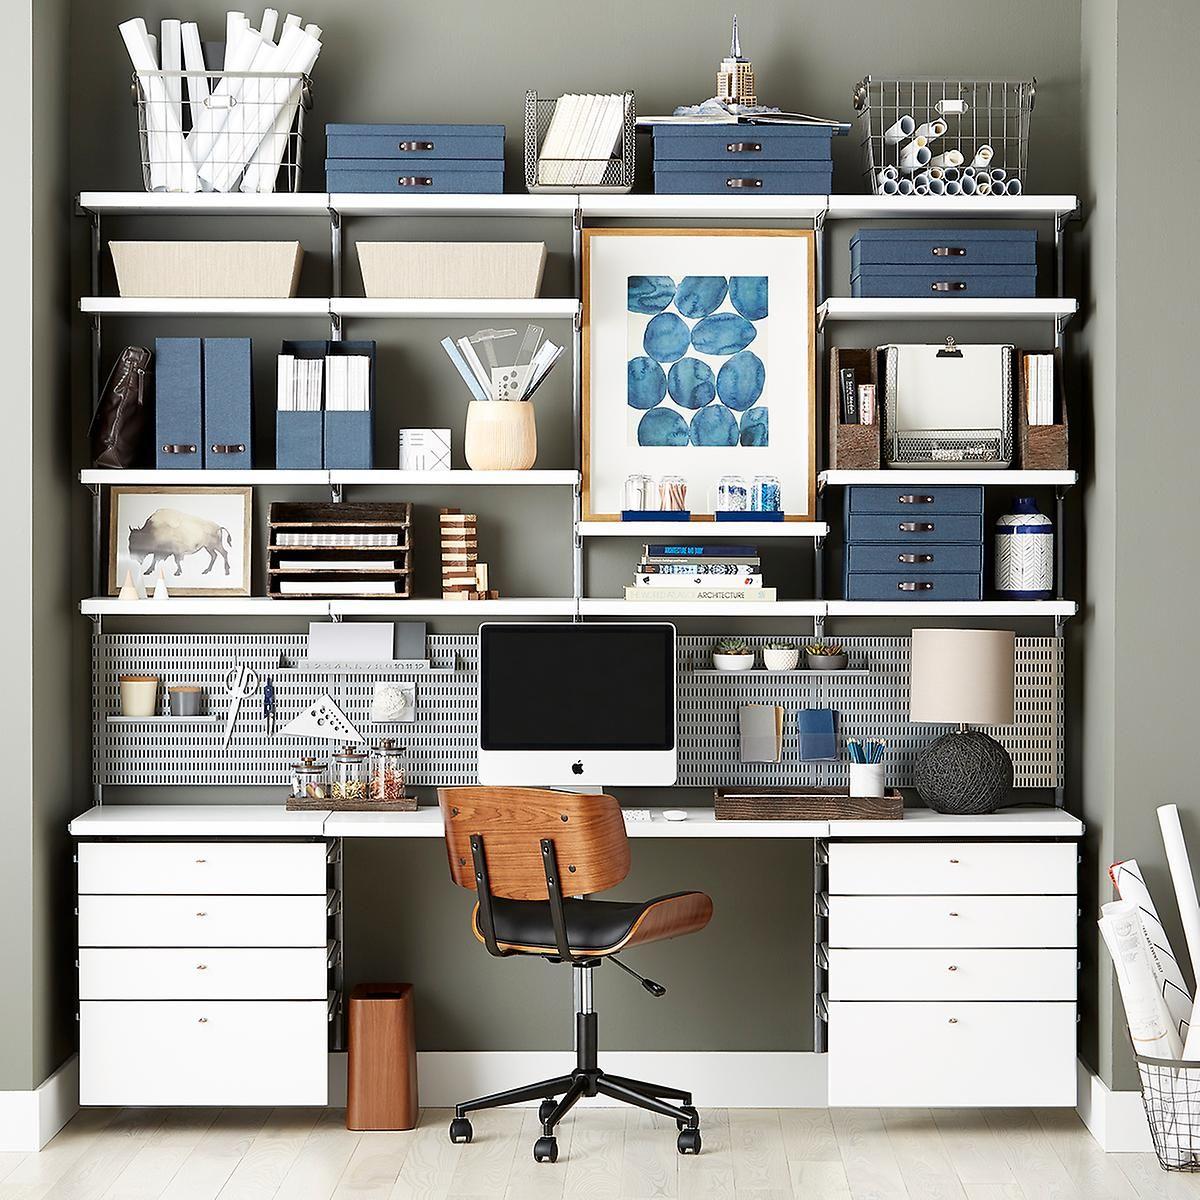 White Platinum Elfa Decor Office Office Shelving Home Office Design Home Office Furniture